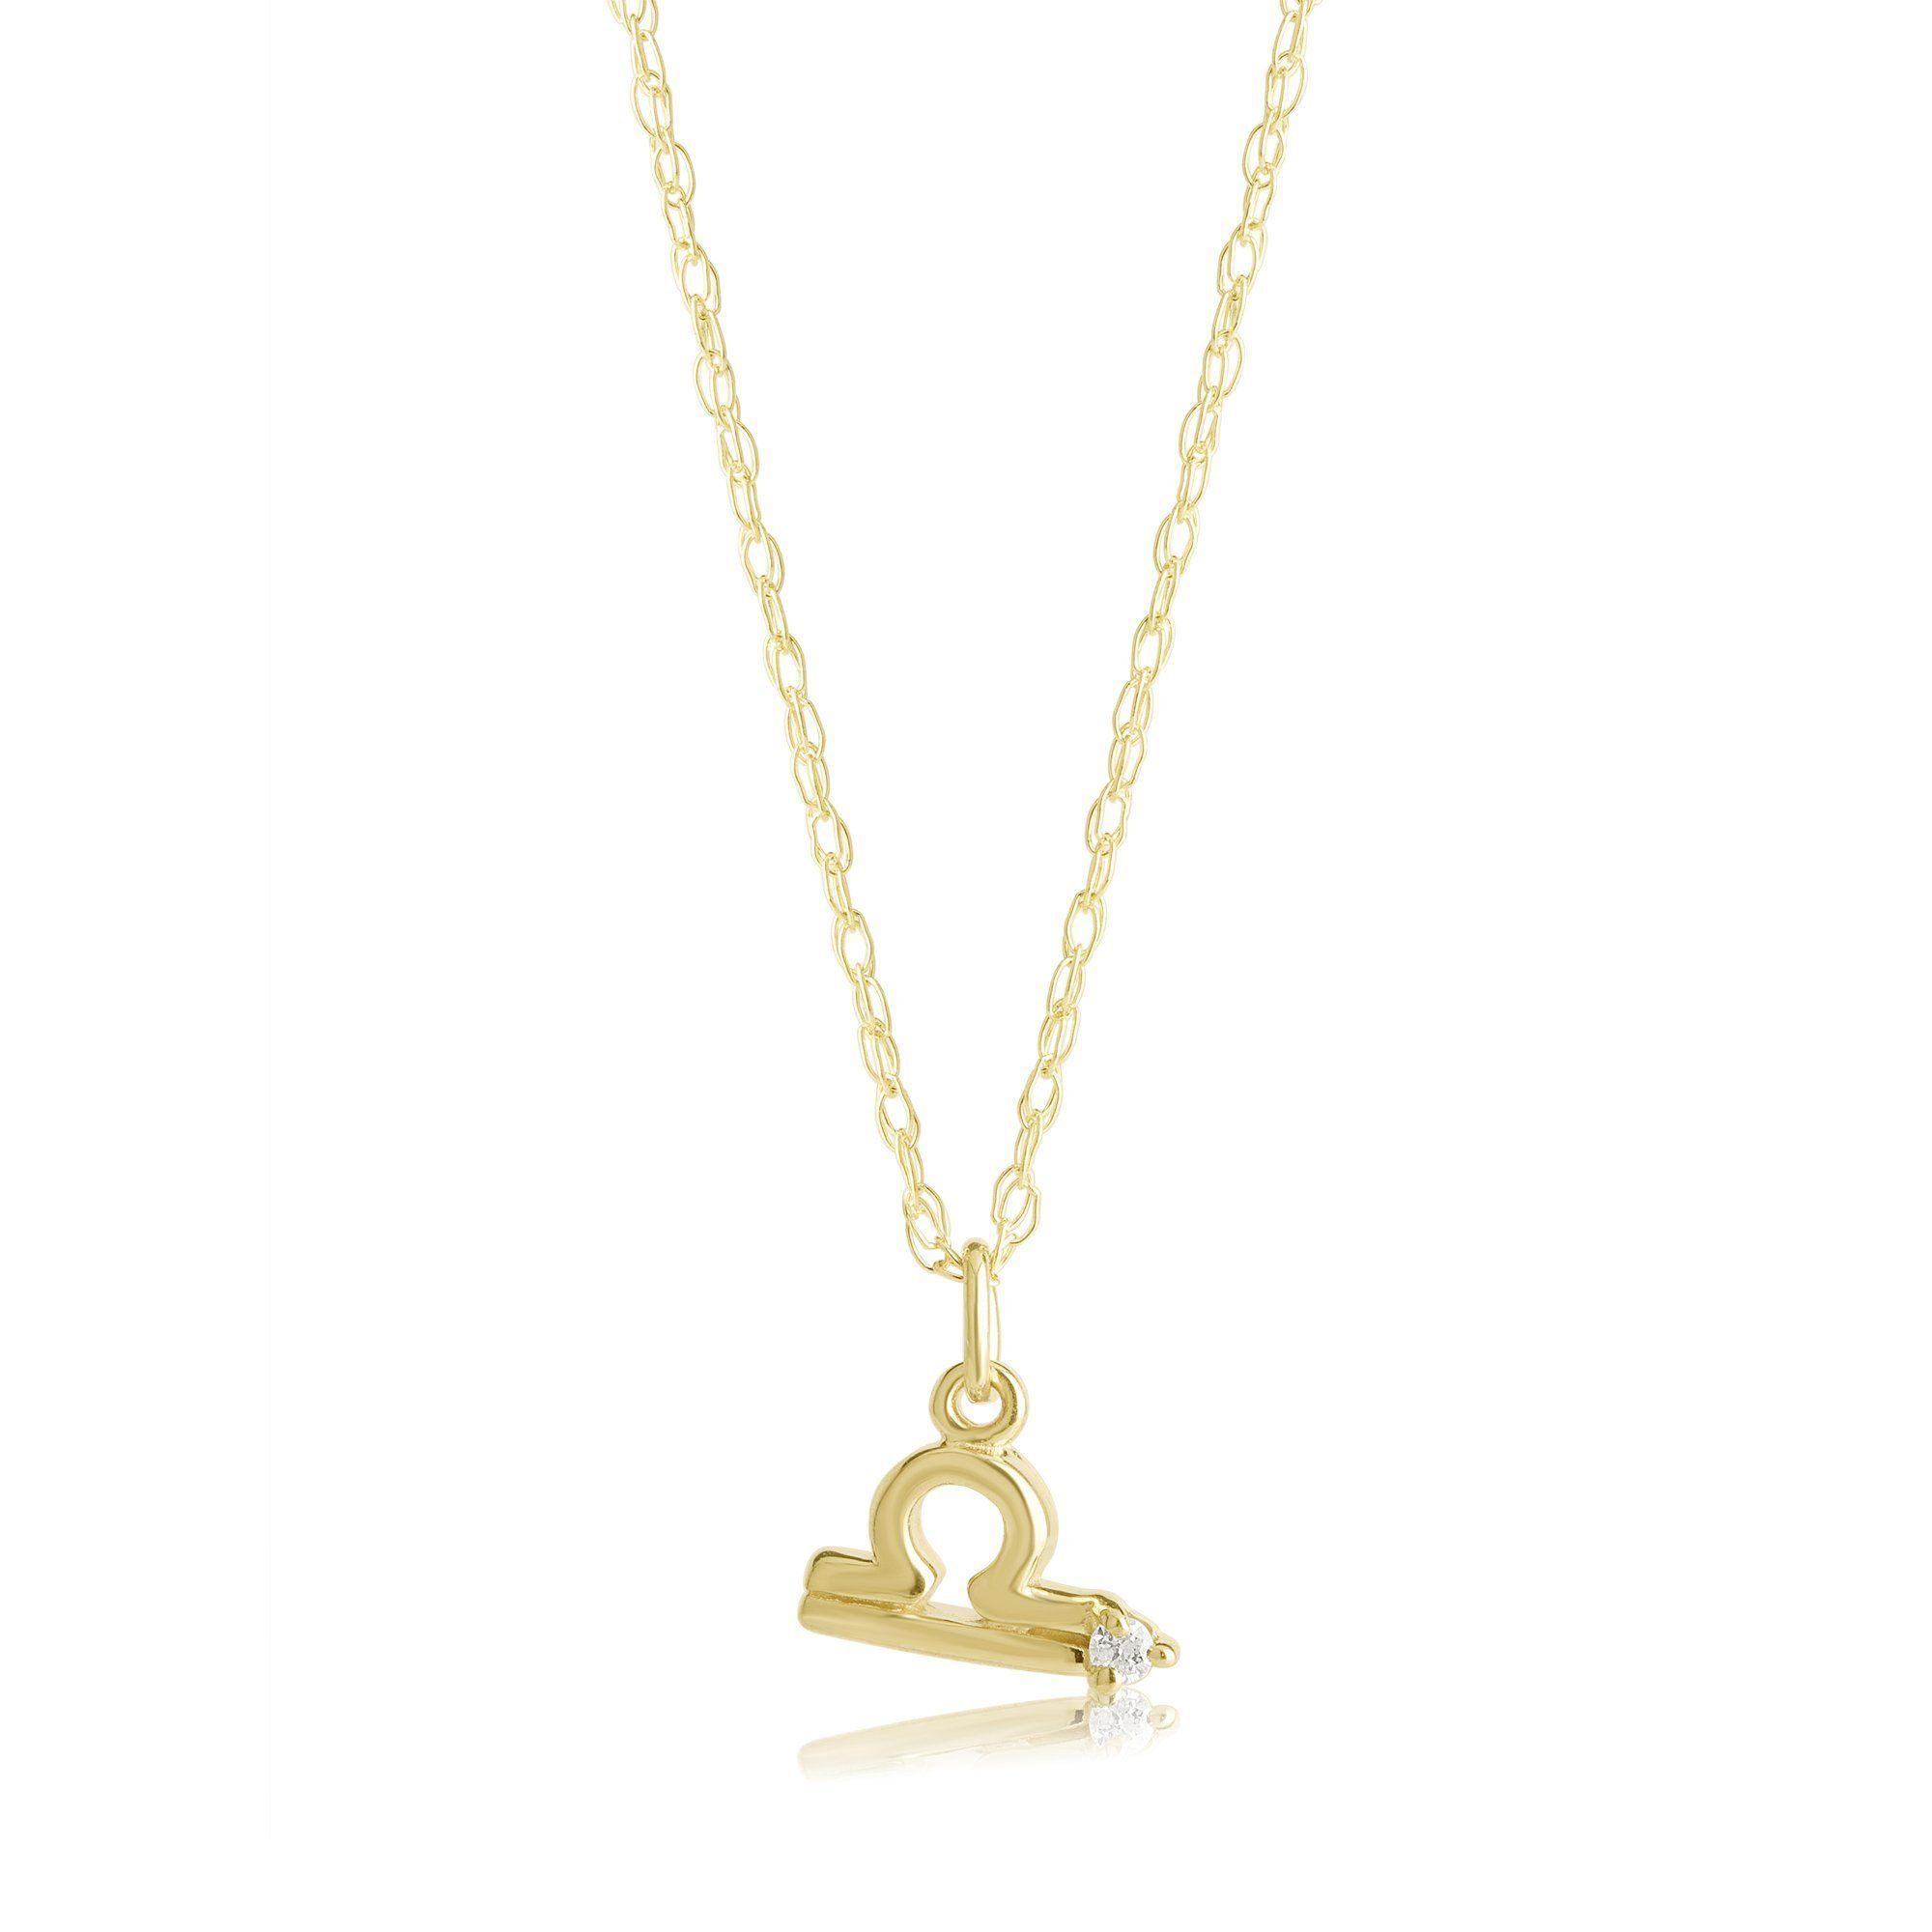 83069a41e Zodiac Charm Necklace with Diamond in 2019 | TB070219 | Diamond ...